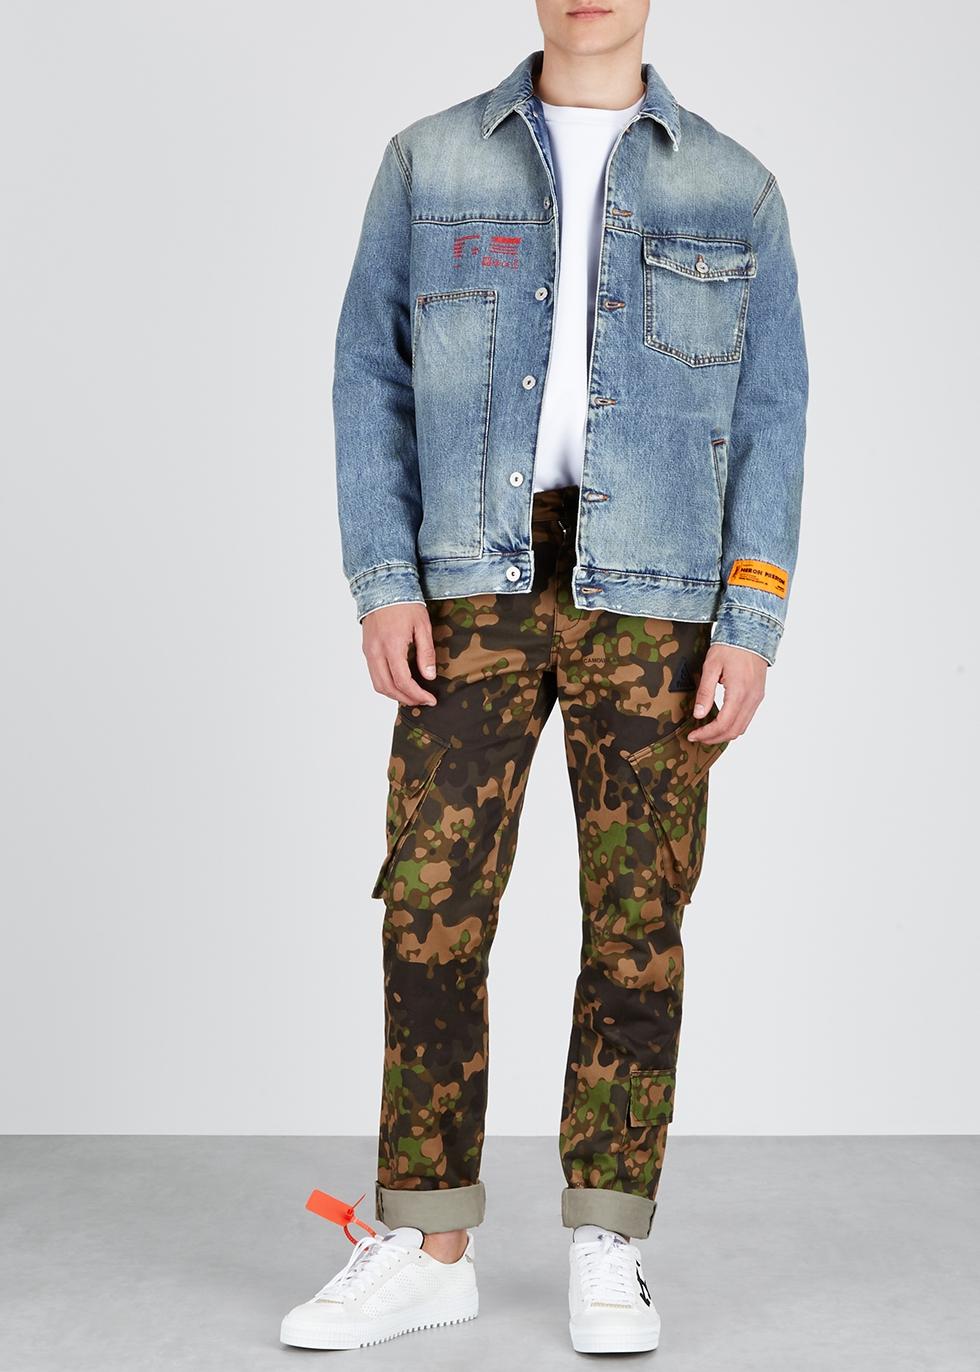 Blue oversized denim jacket - Heron Preston